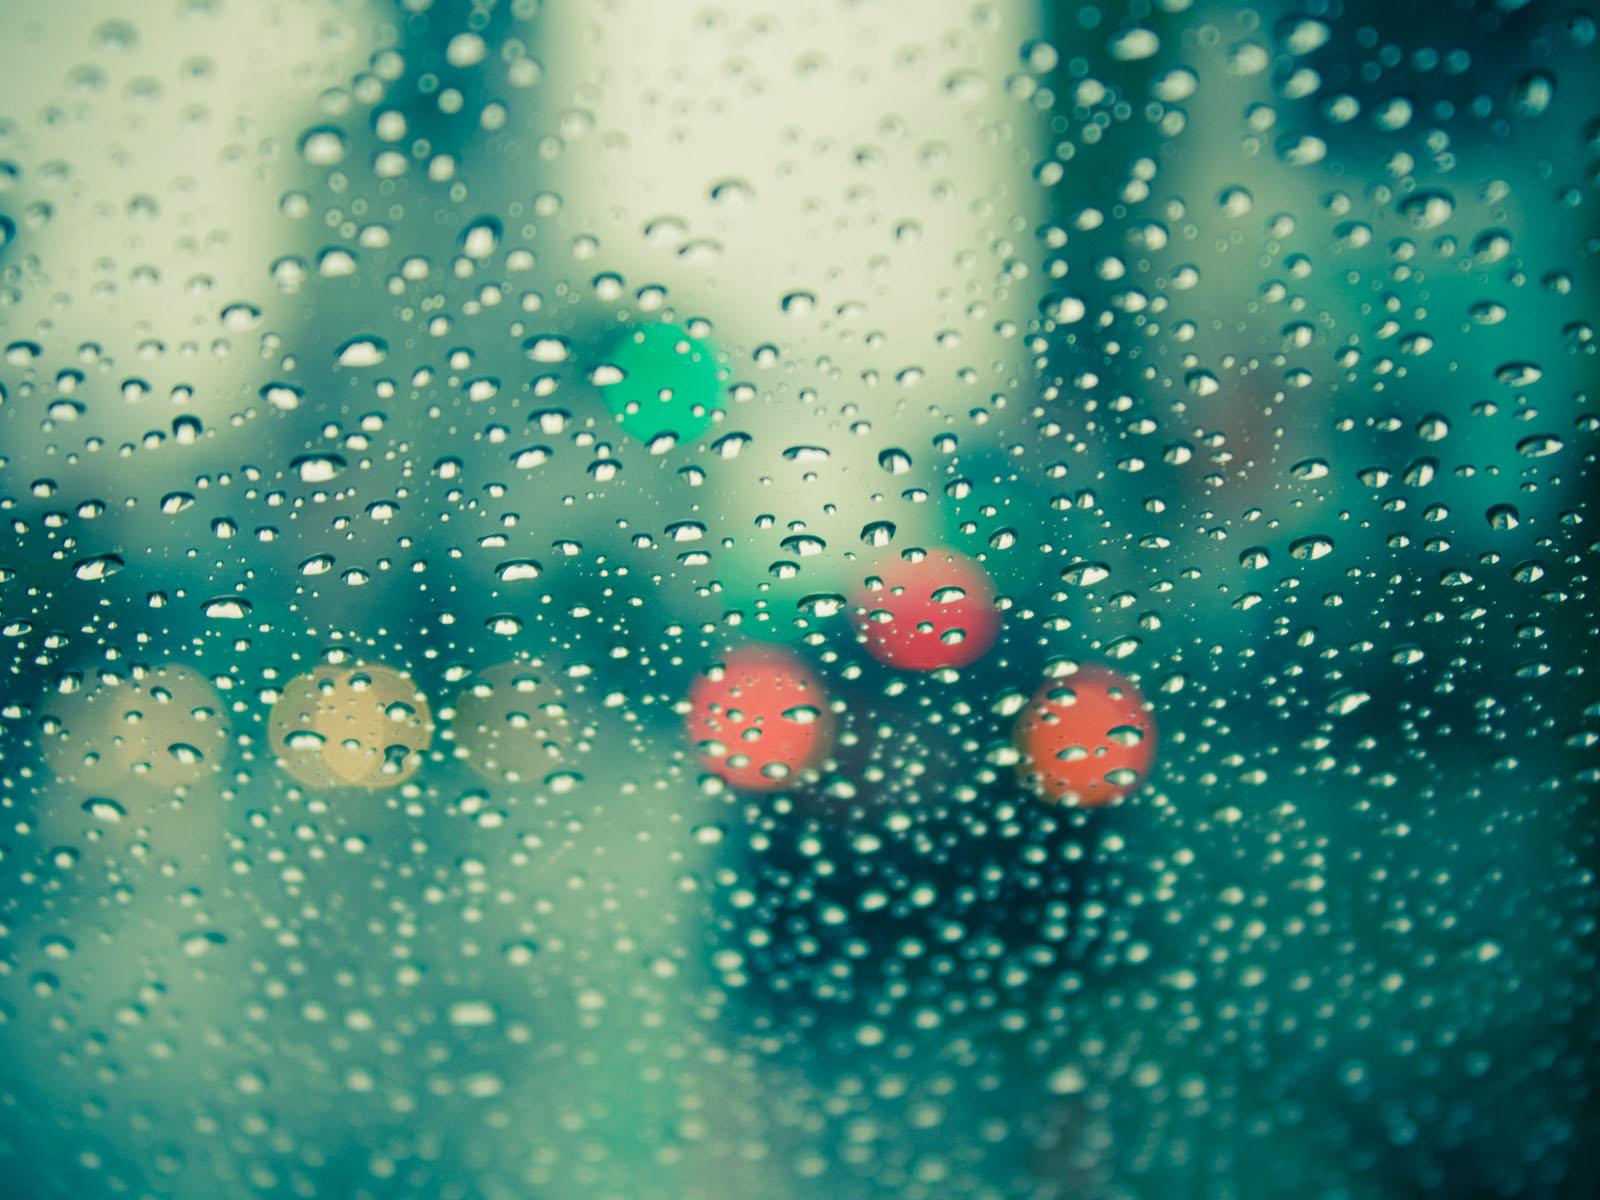 Tarzan Car Wallpaper Free Download Wallpaper Rain Drops On Glass Wallpapers